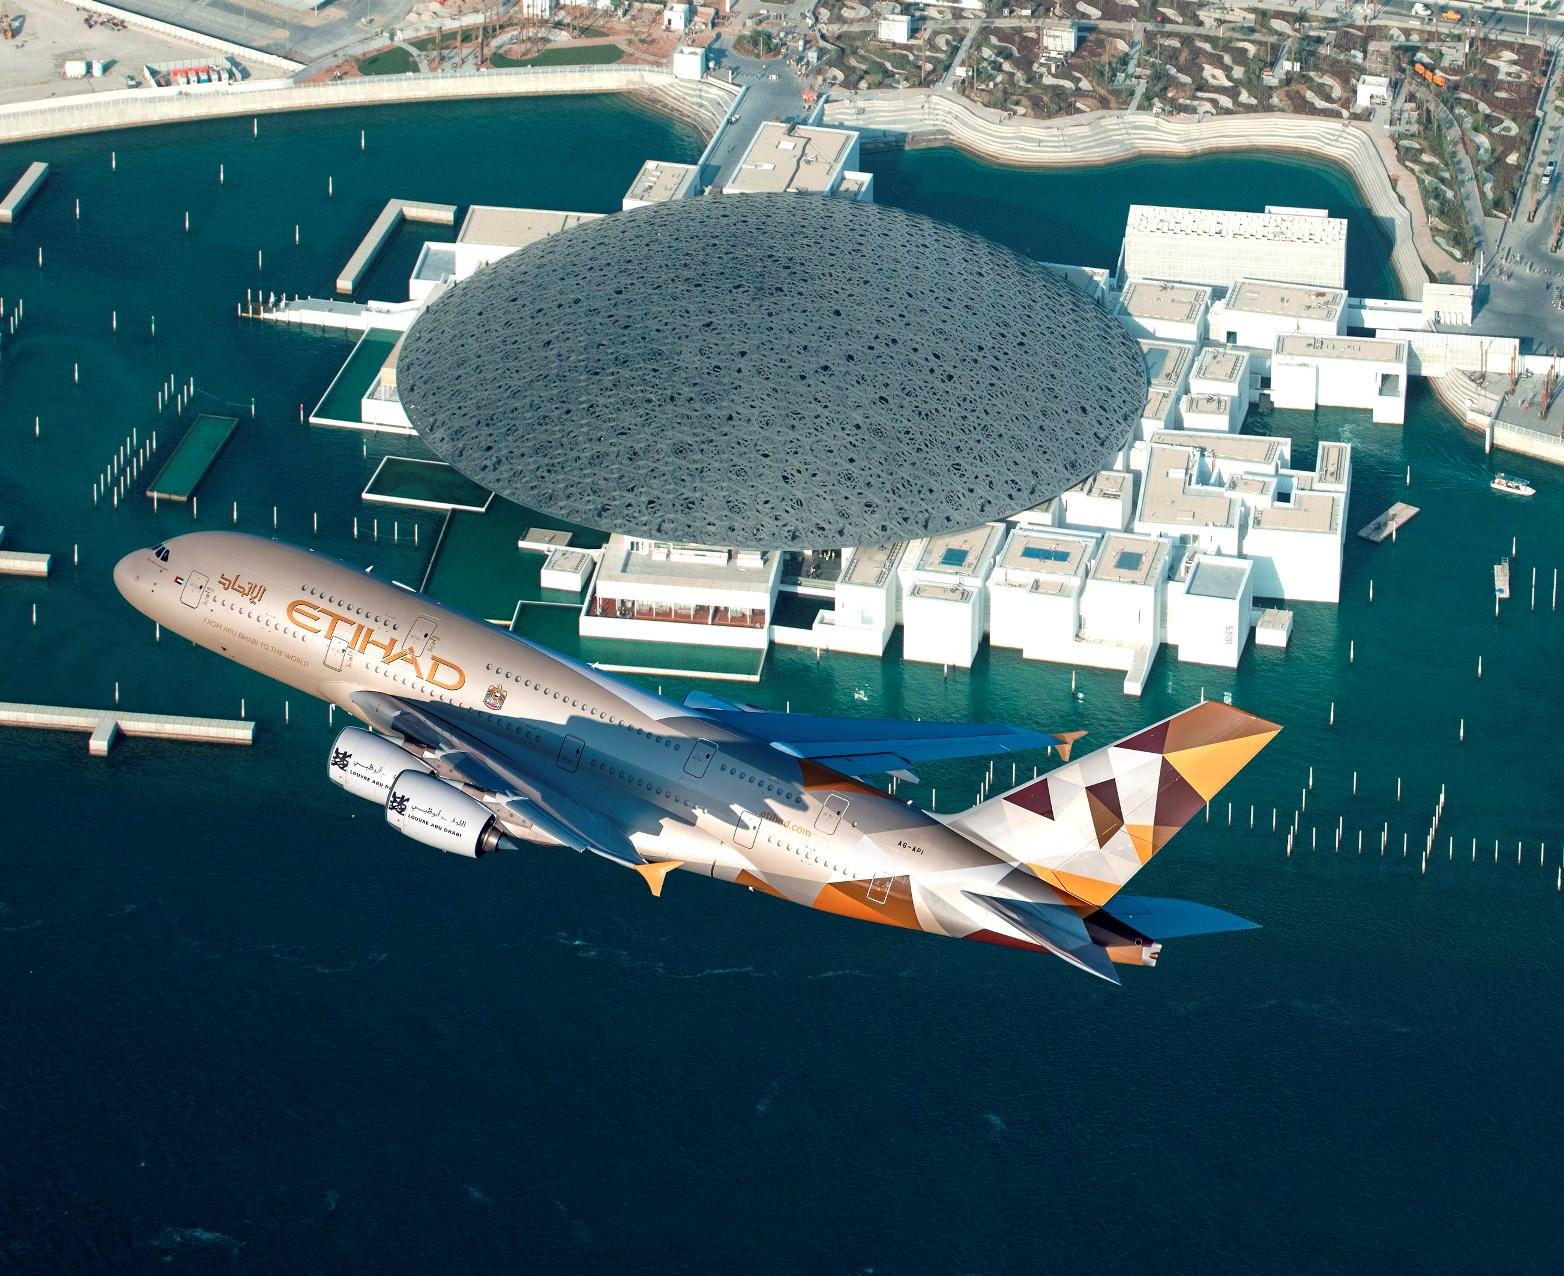 Flugkapriolen über dem neuen Louvre-Museum: A 380 im Tiefflug